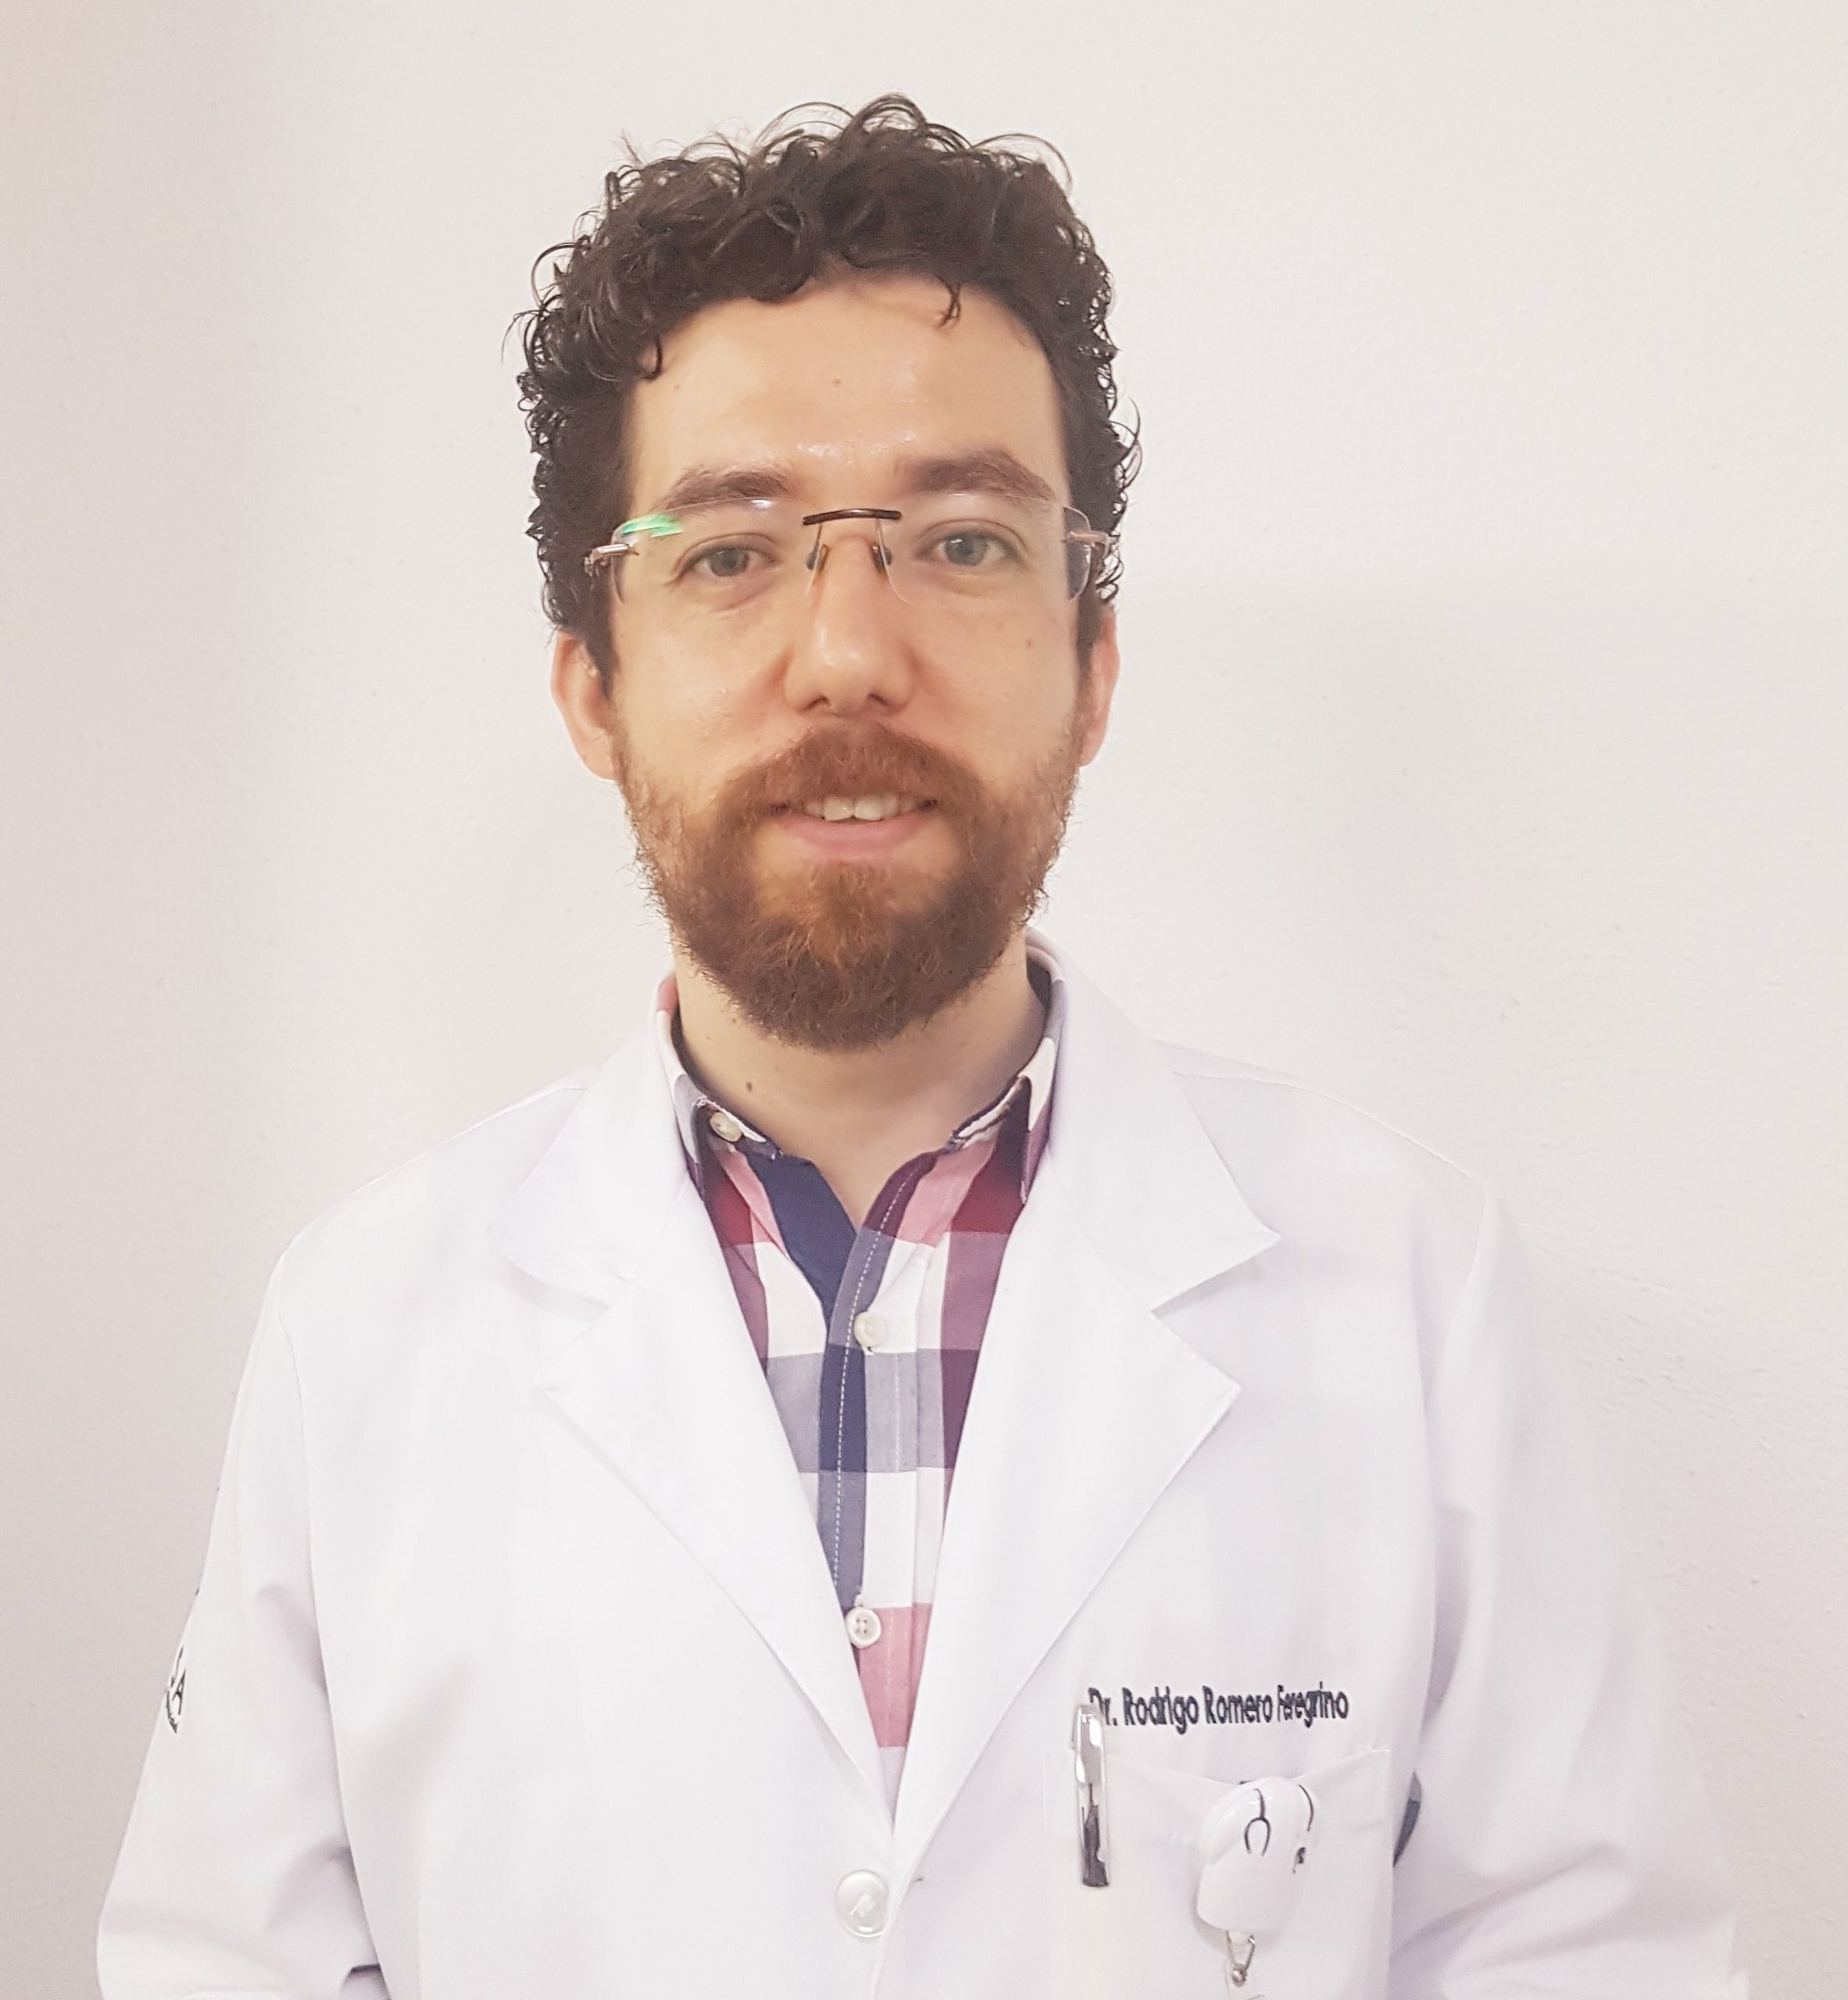 Rodrigo Romero Feregrino-foto[698]